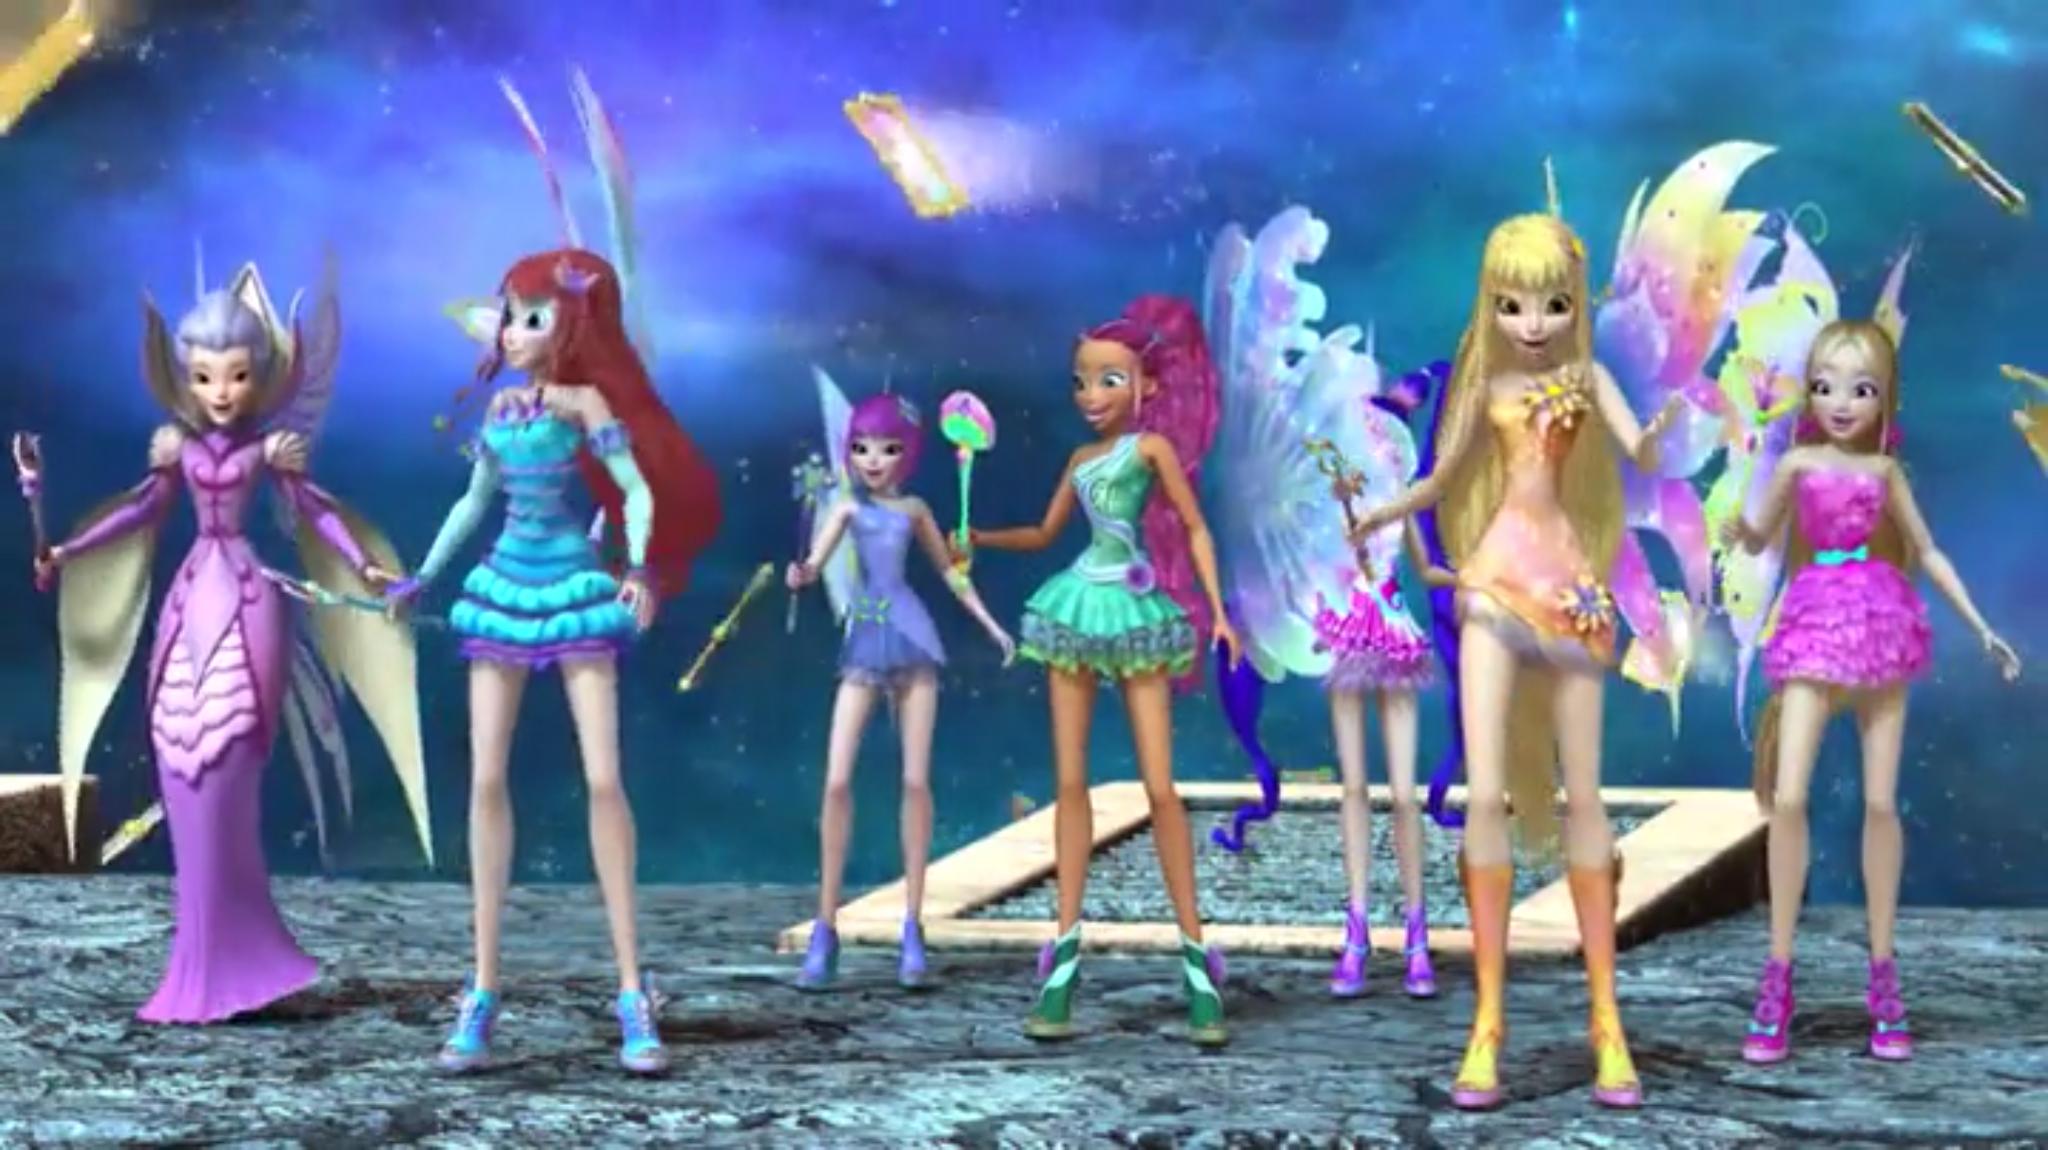 The Fairies in Mythix